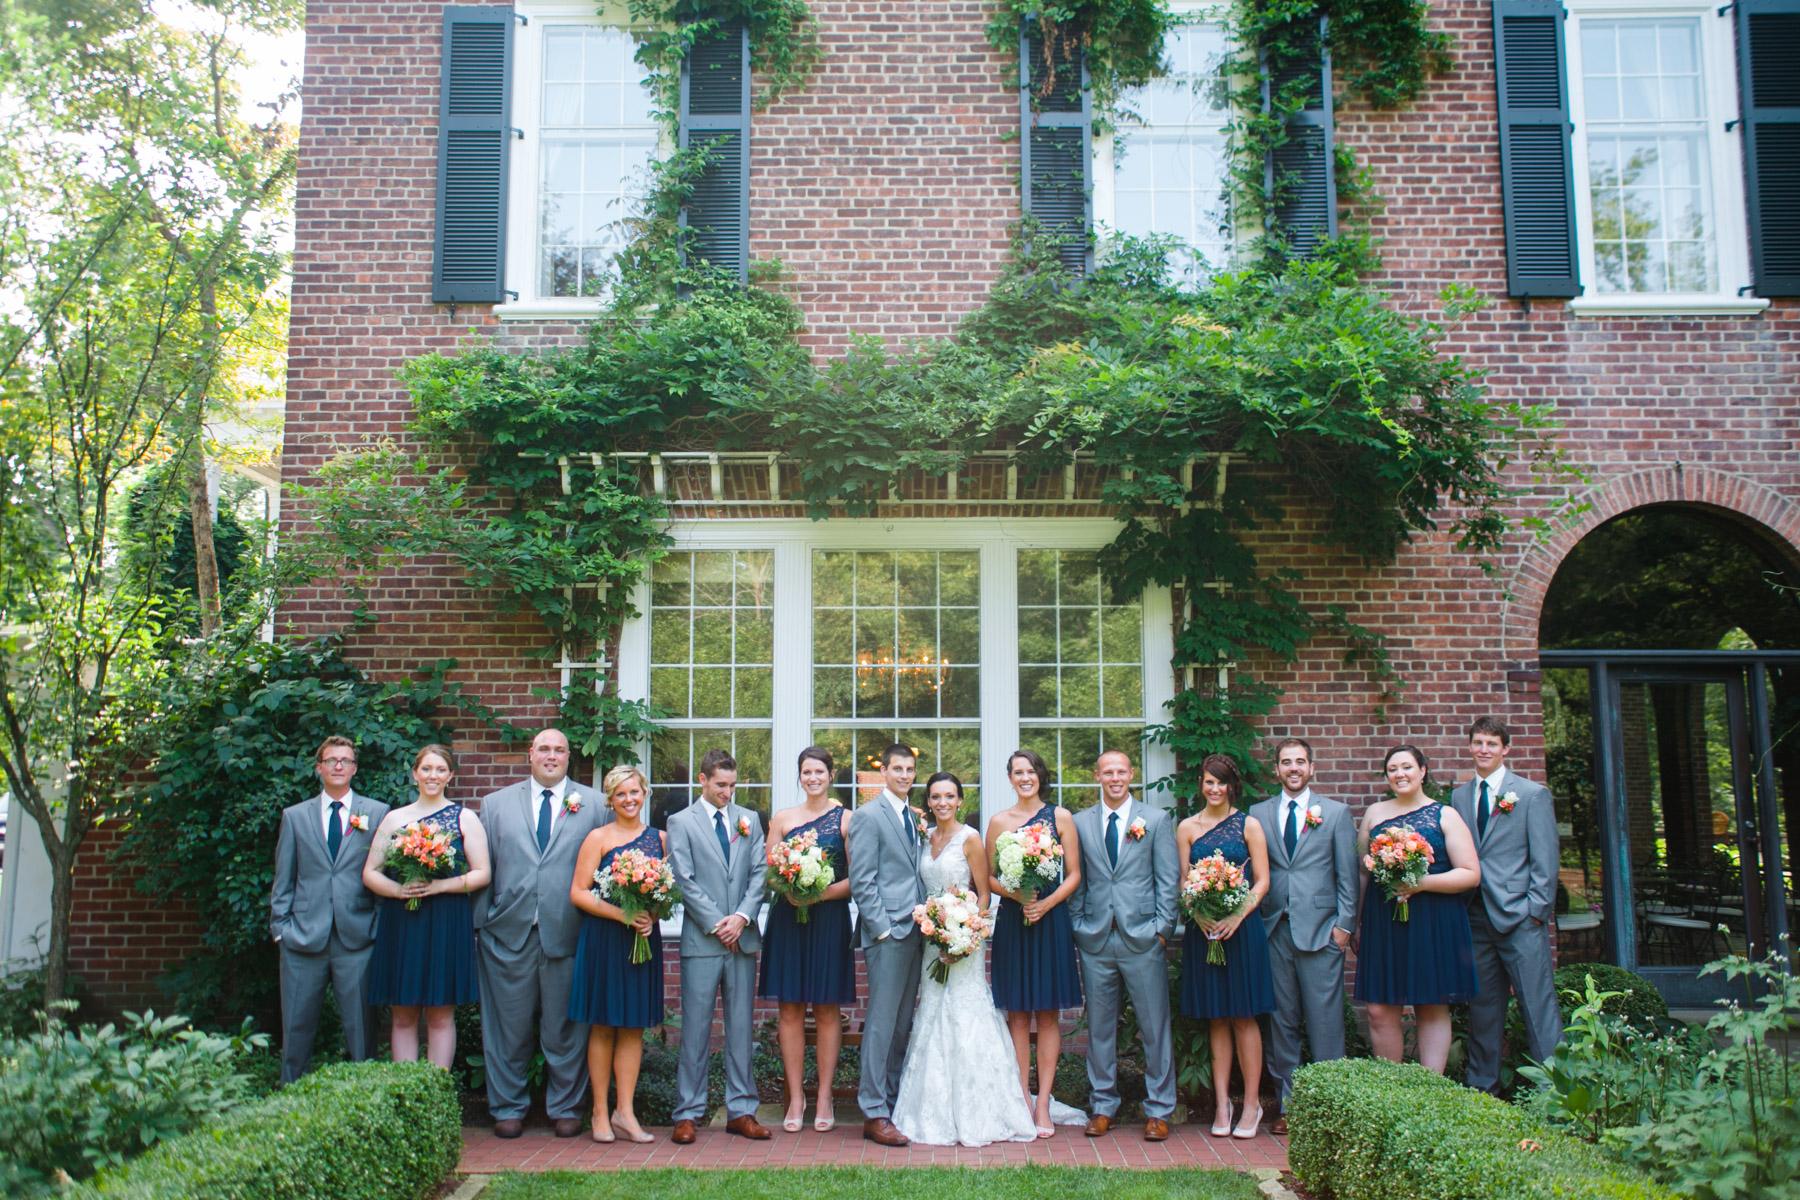 wildwood-park-wedding-photos-75.jpg